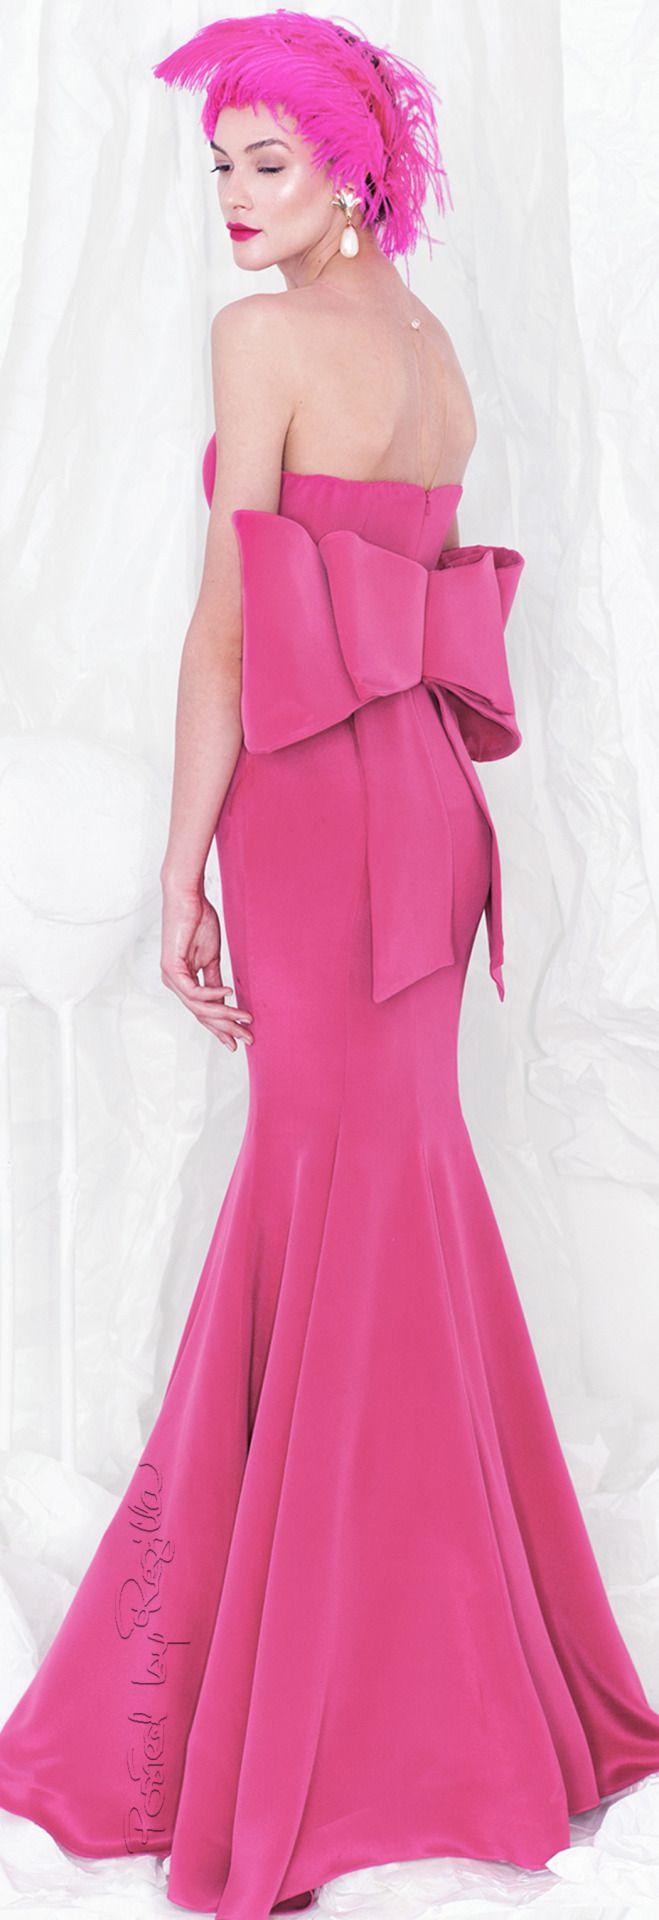 146 best romanian evening dresses images on Pinterest | Evening ...